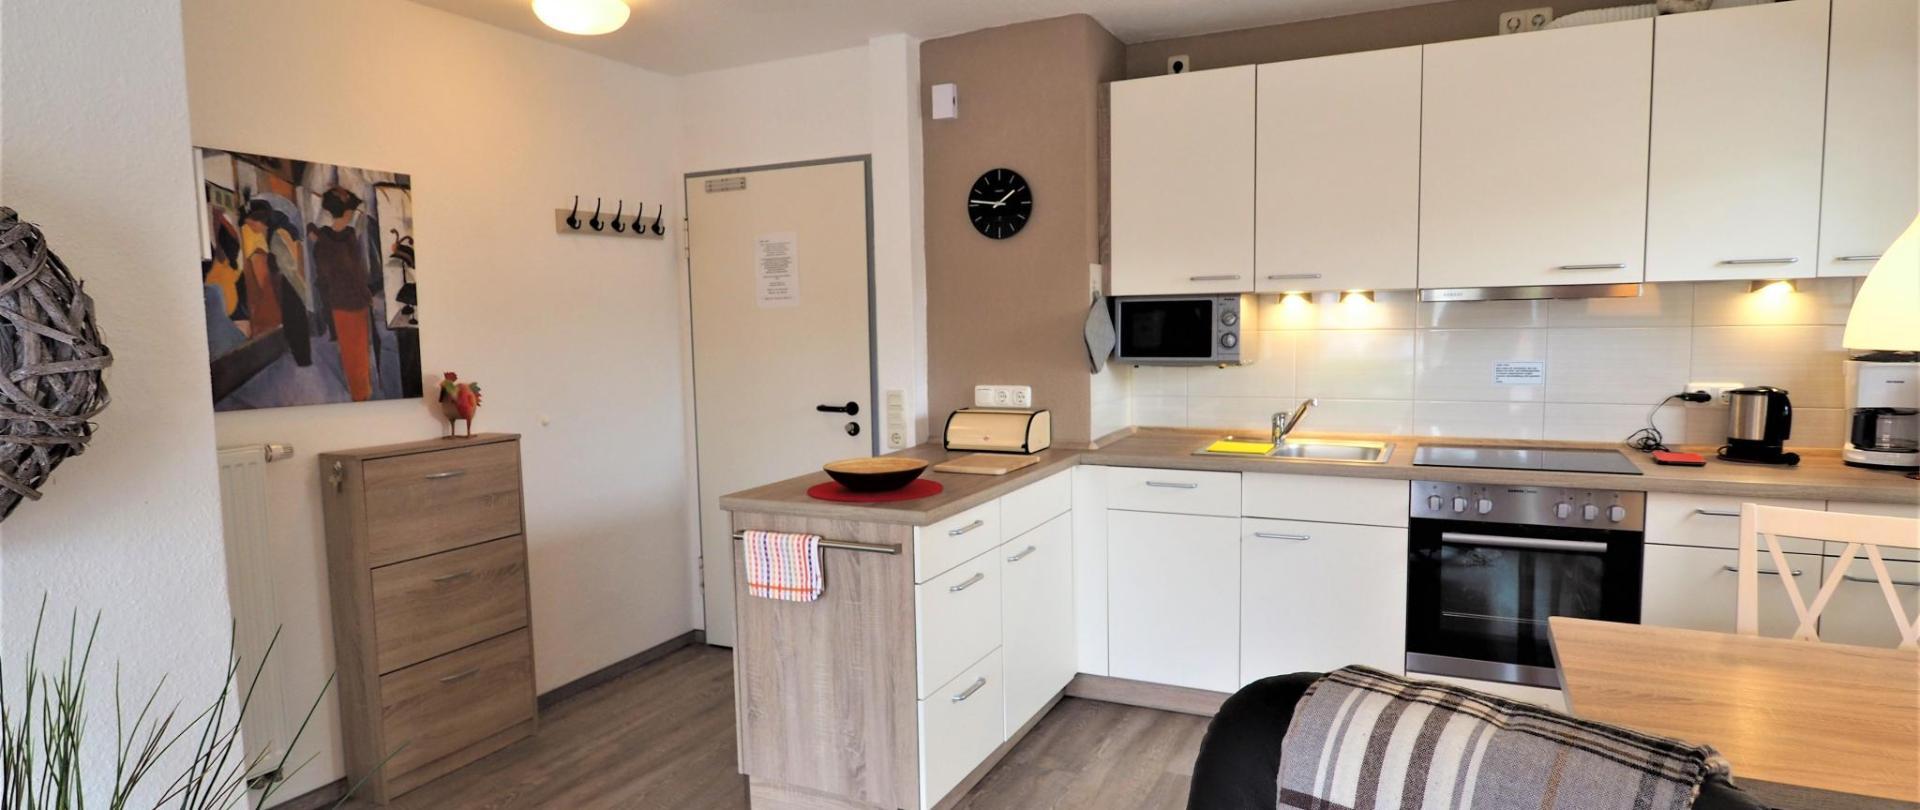 Apartment Alleestraße